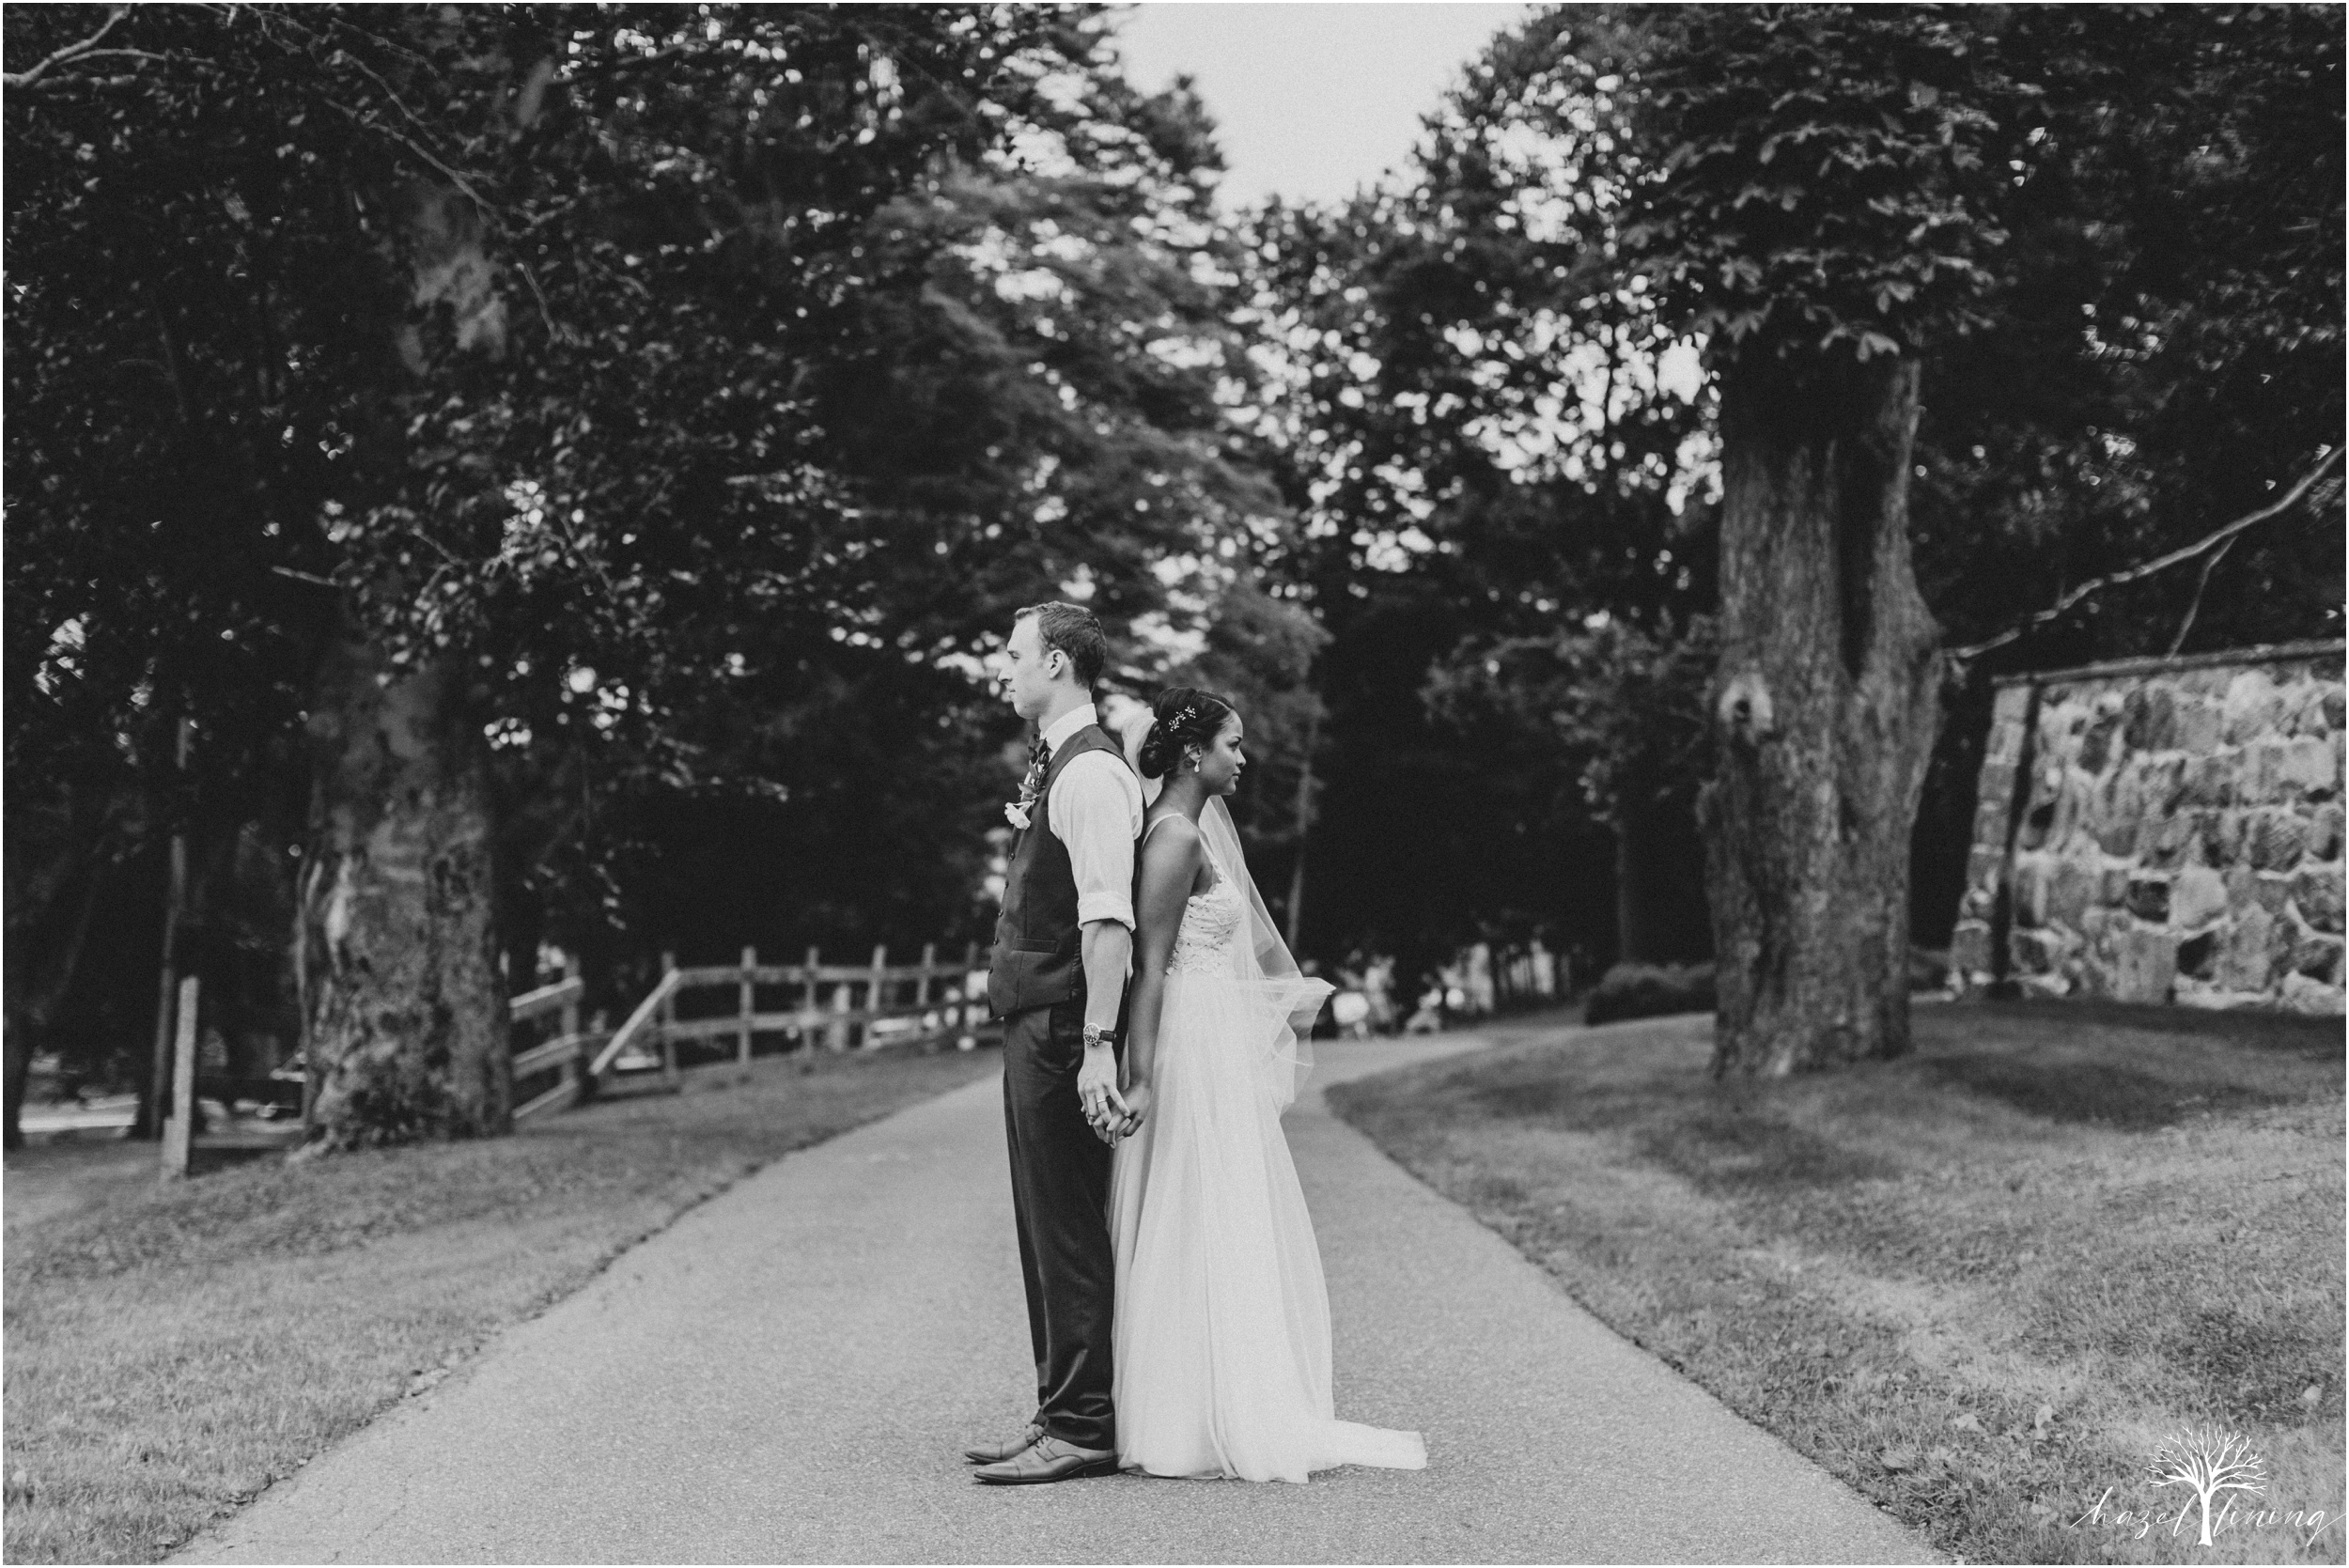 mariah-kreyling-samuel-sherratt-sherrattwiththeworld-peirce-farm-at-witch-hill-boston-massachusetts-wedding-photography-hazel-lining-travel-wedding-elopement-photography_0134.jpg